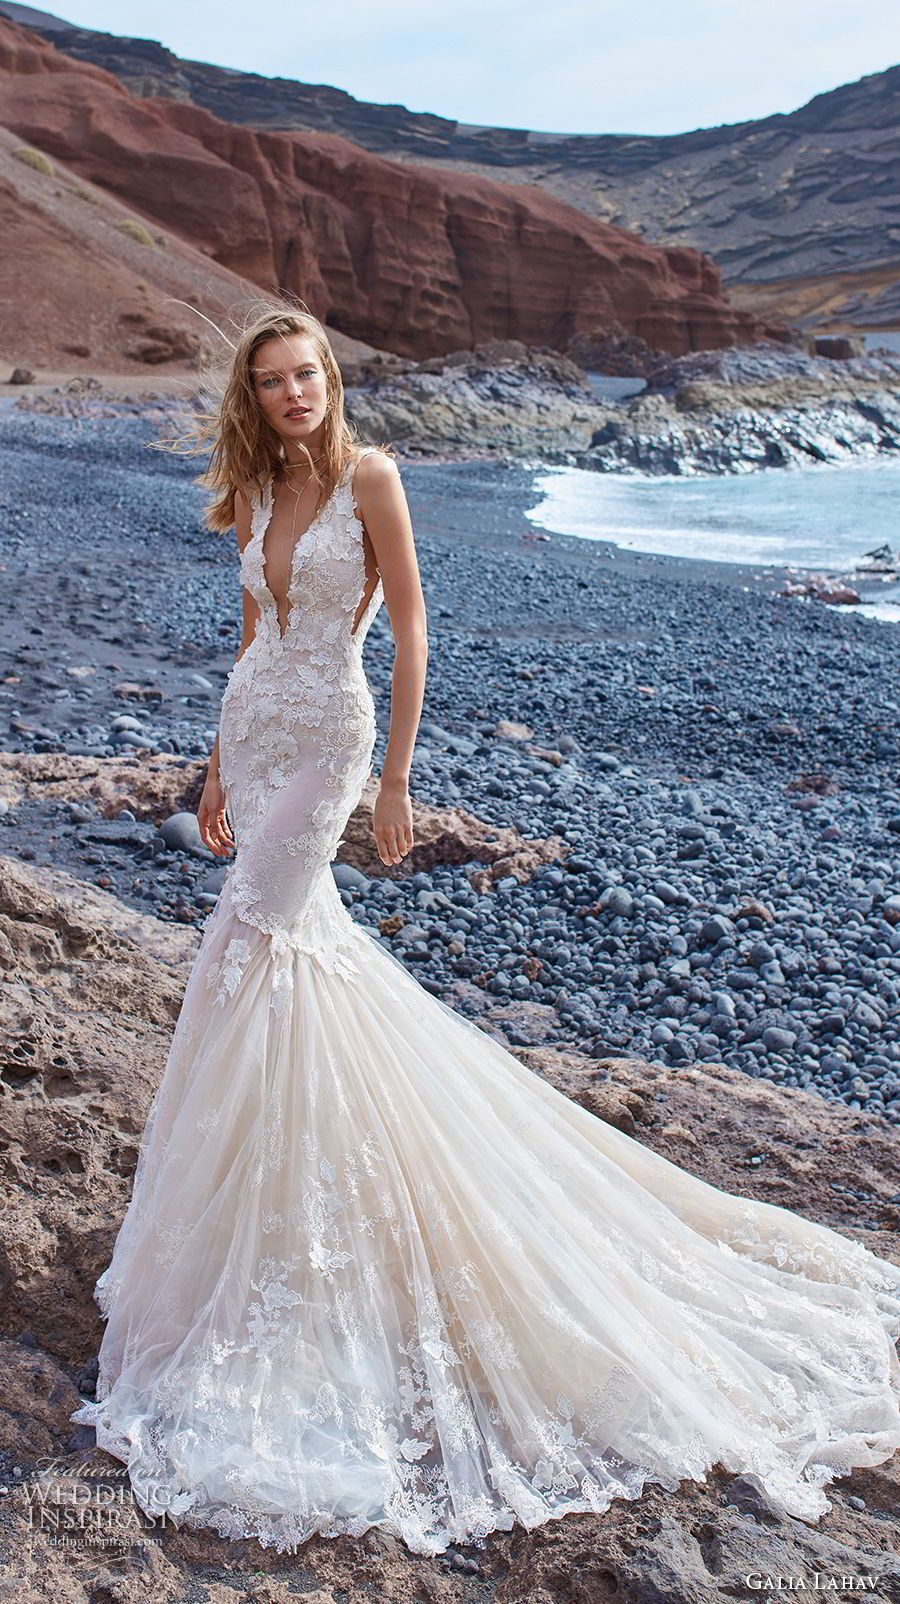 Gala by Galia Lahav Collection No. 5 Wedding Dresses   Galia lahav ...